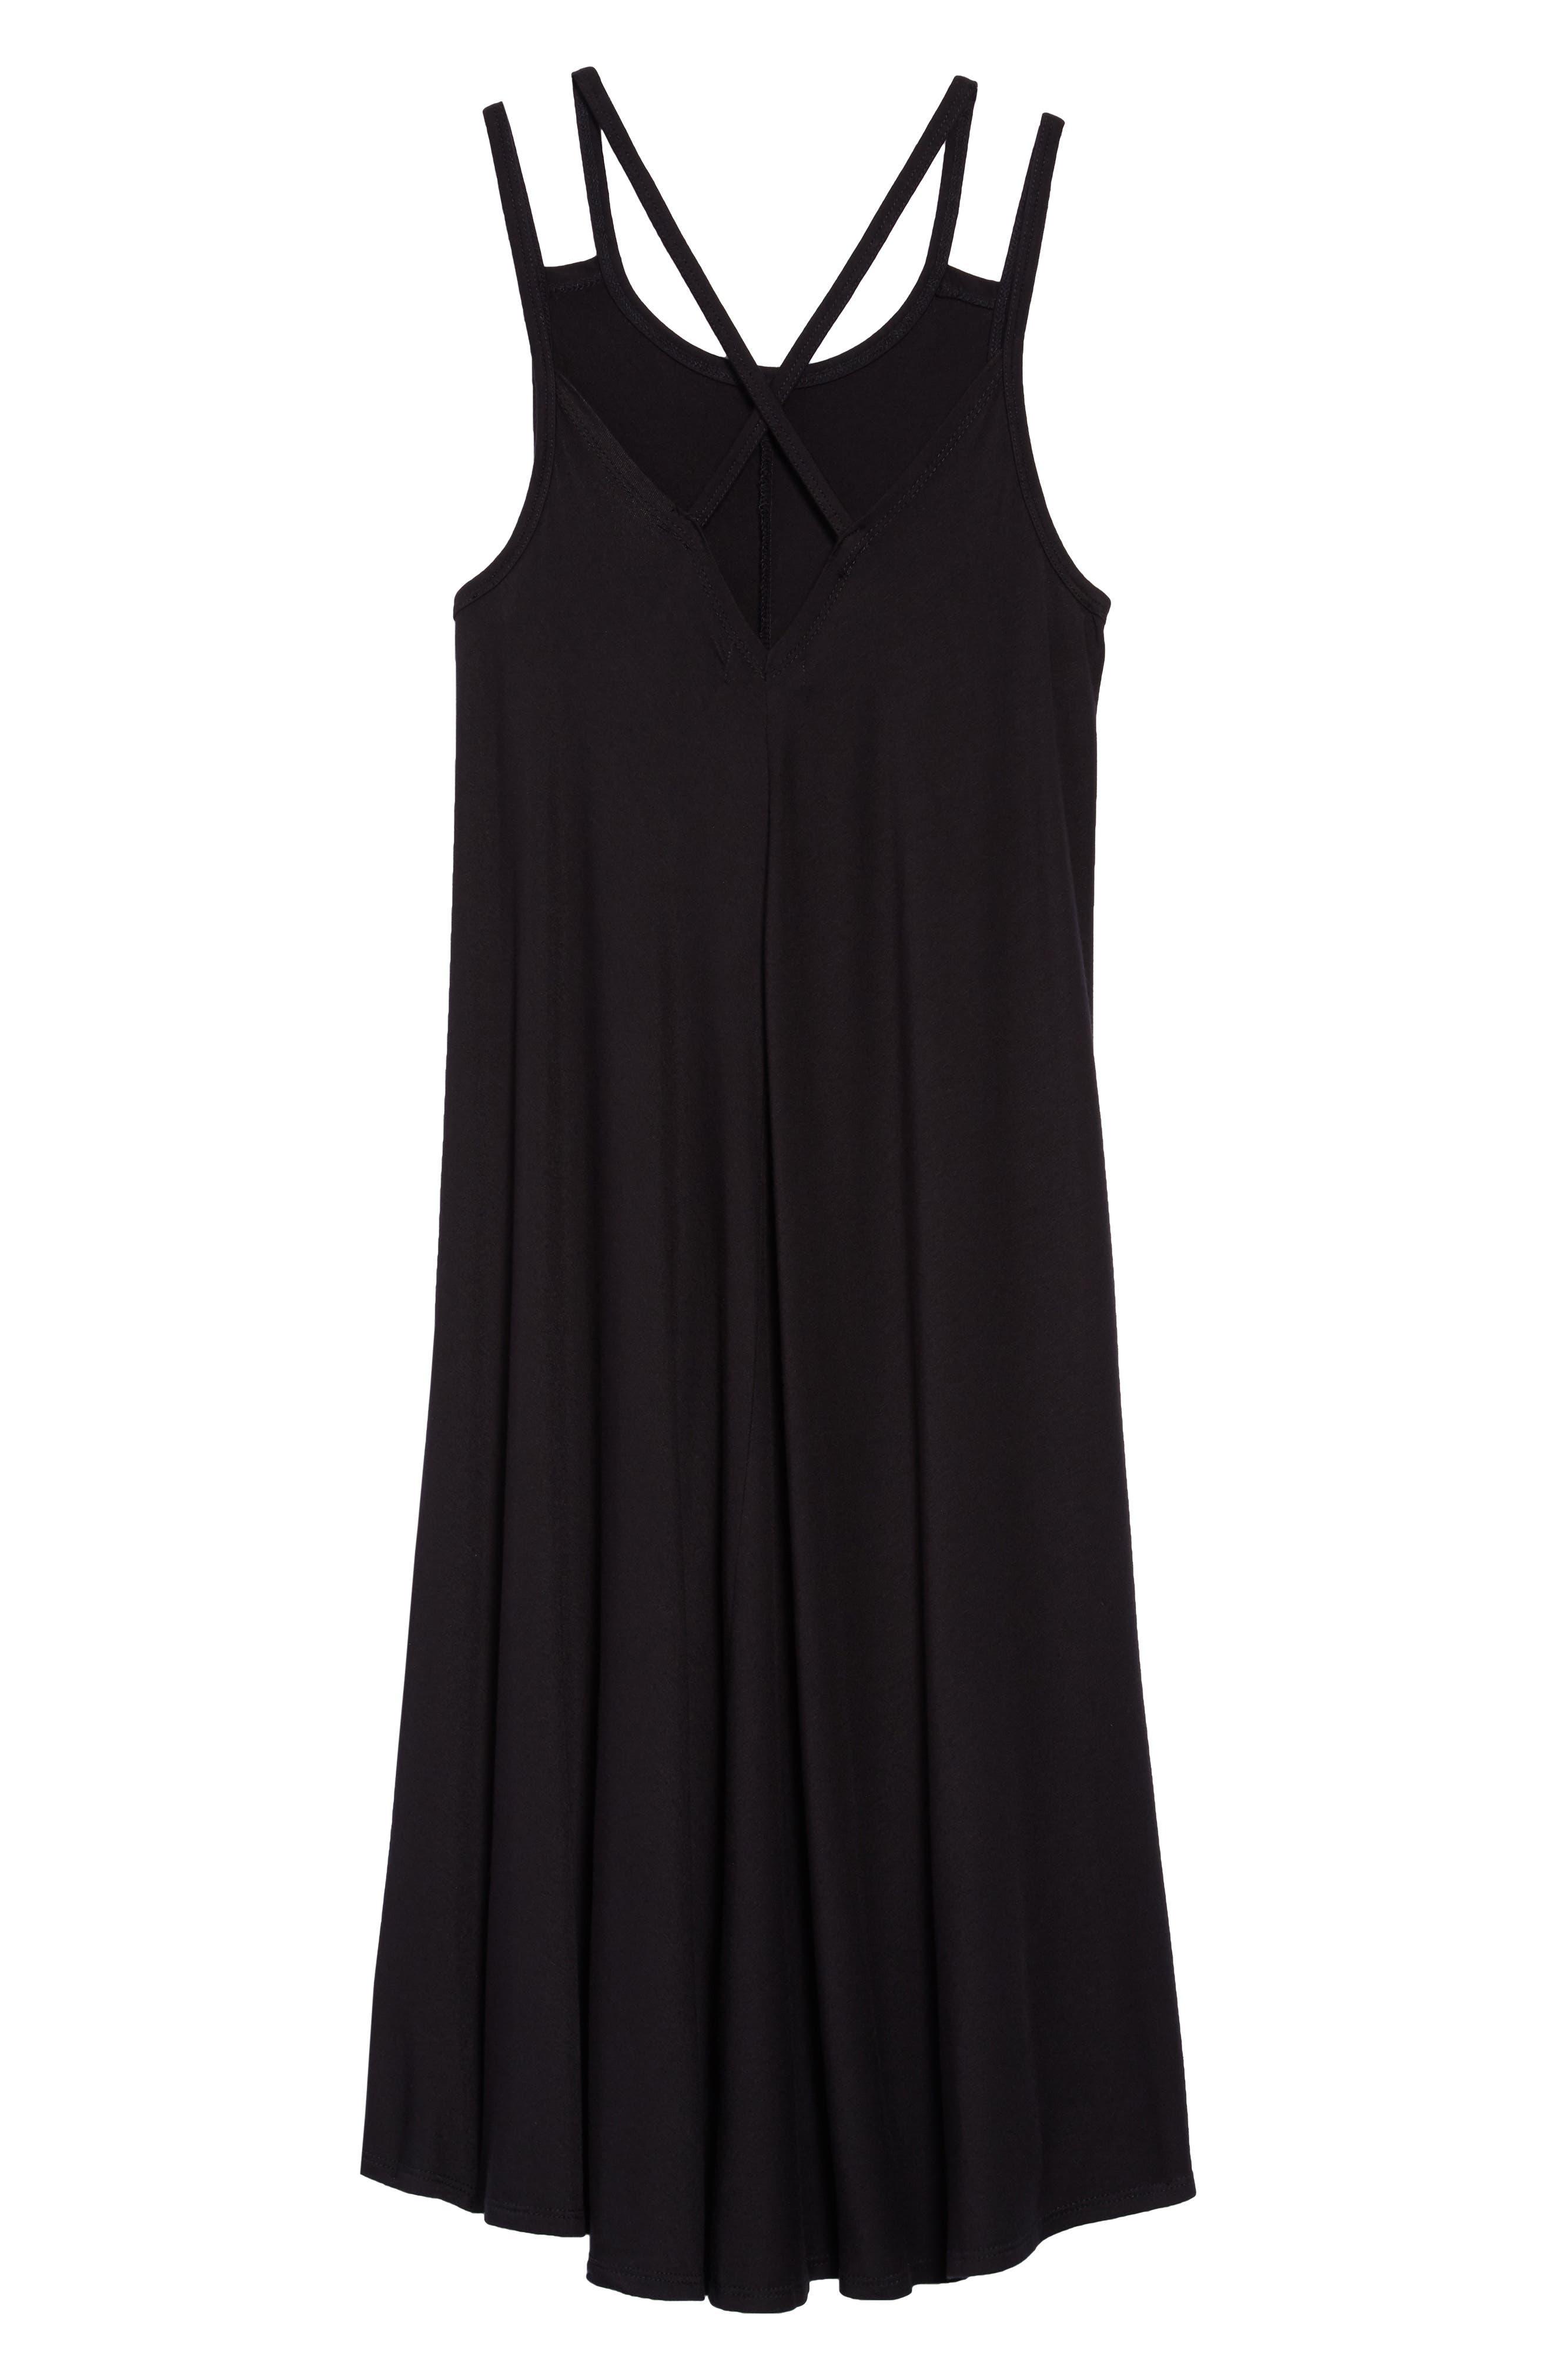 Strappy Dress,                             Alternate thumbnail 2, color,                             Black